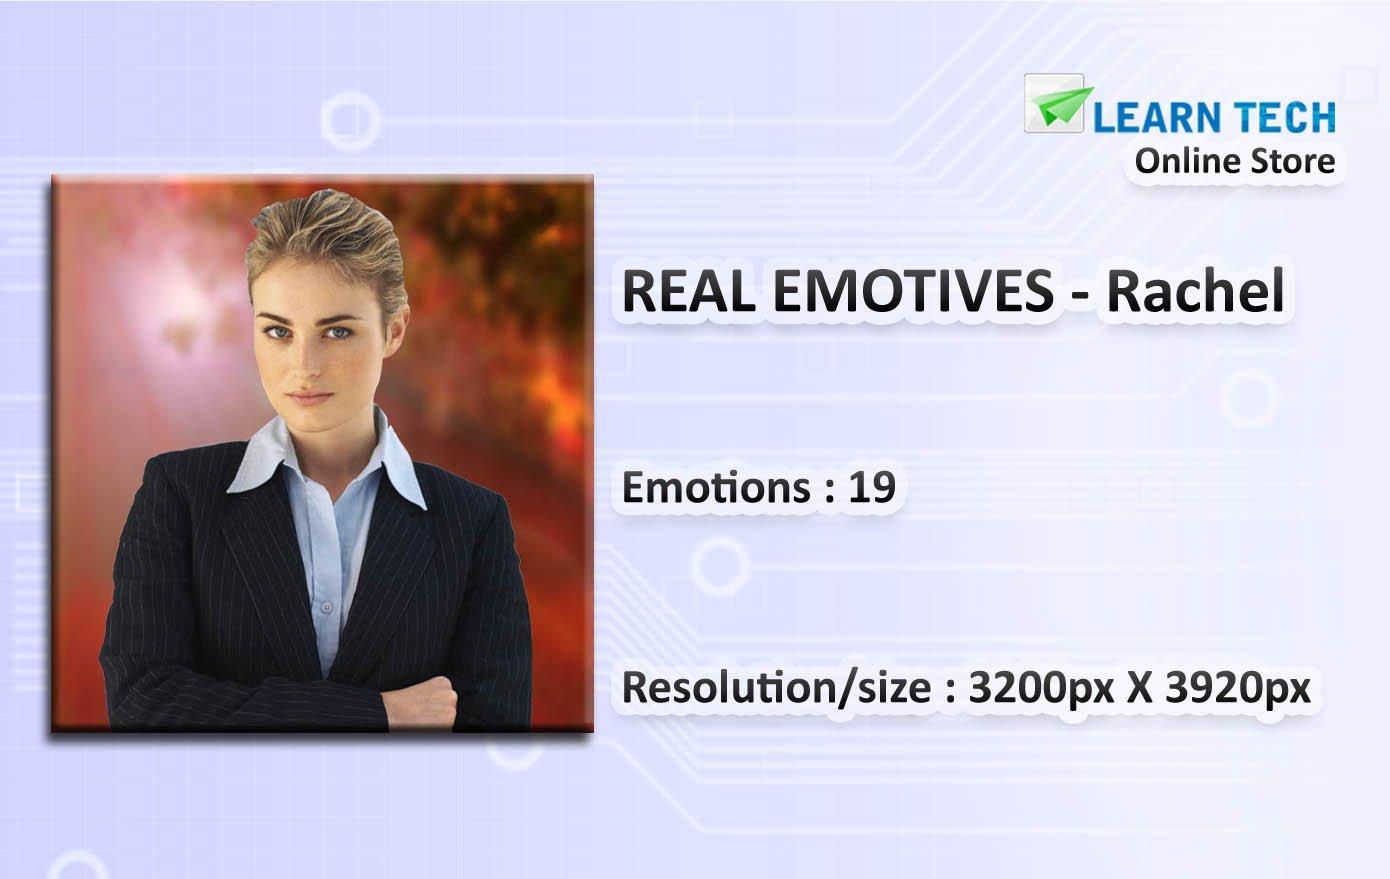 Rachel-Character Packs for training decks-PowerPoint-E learning Solutions